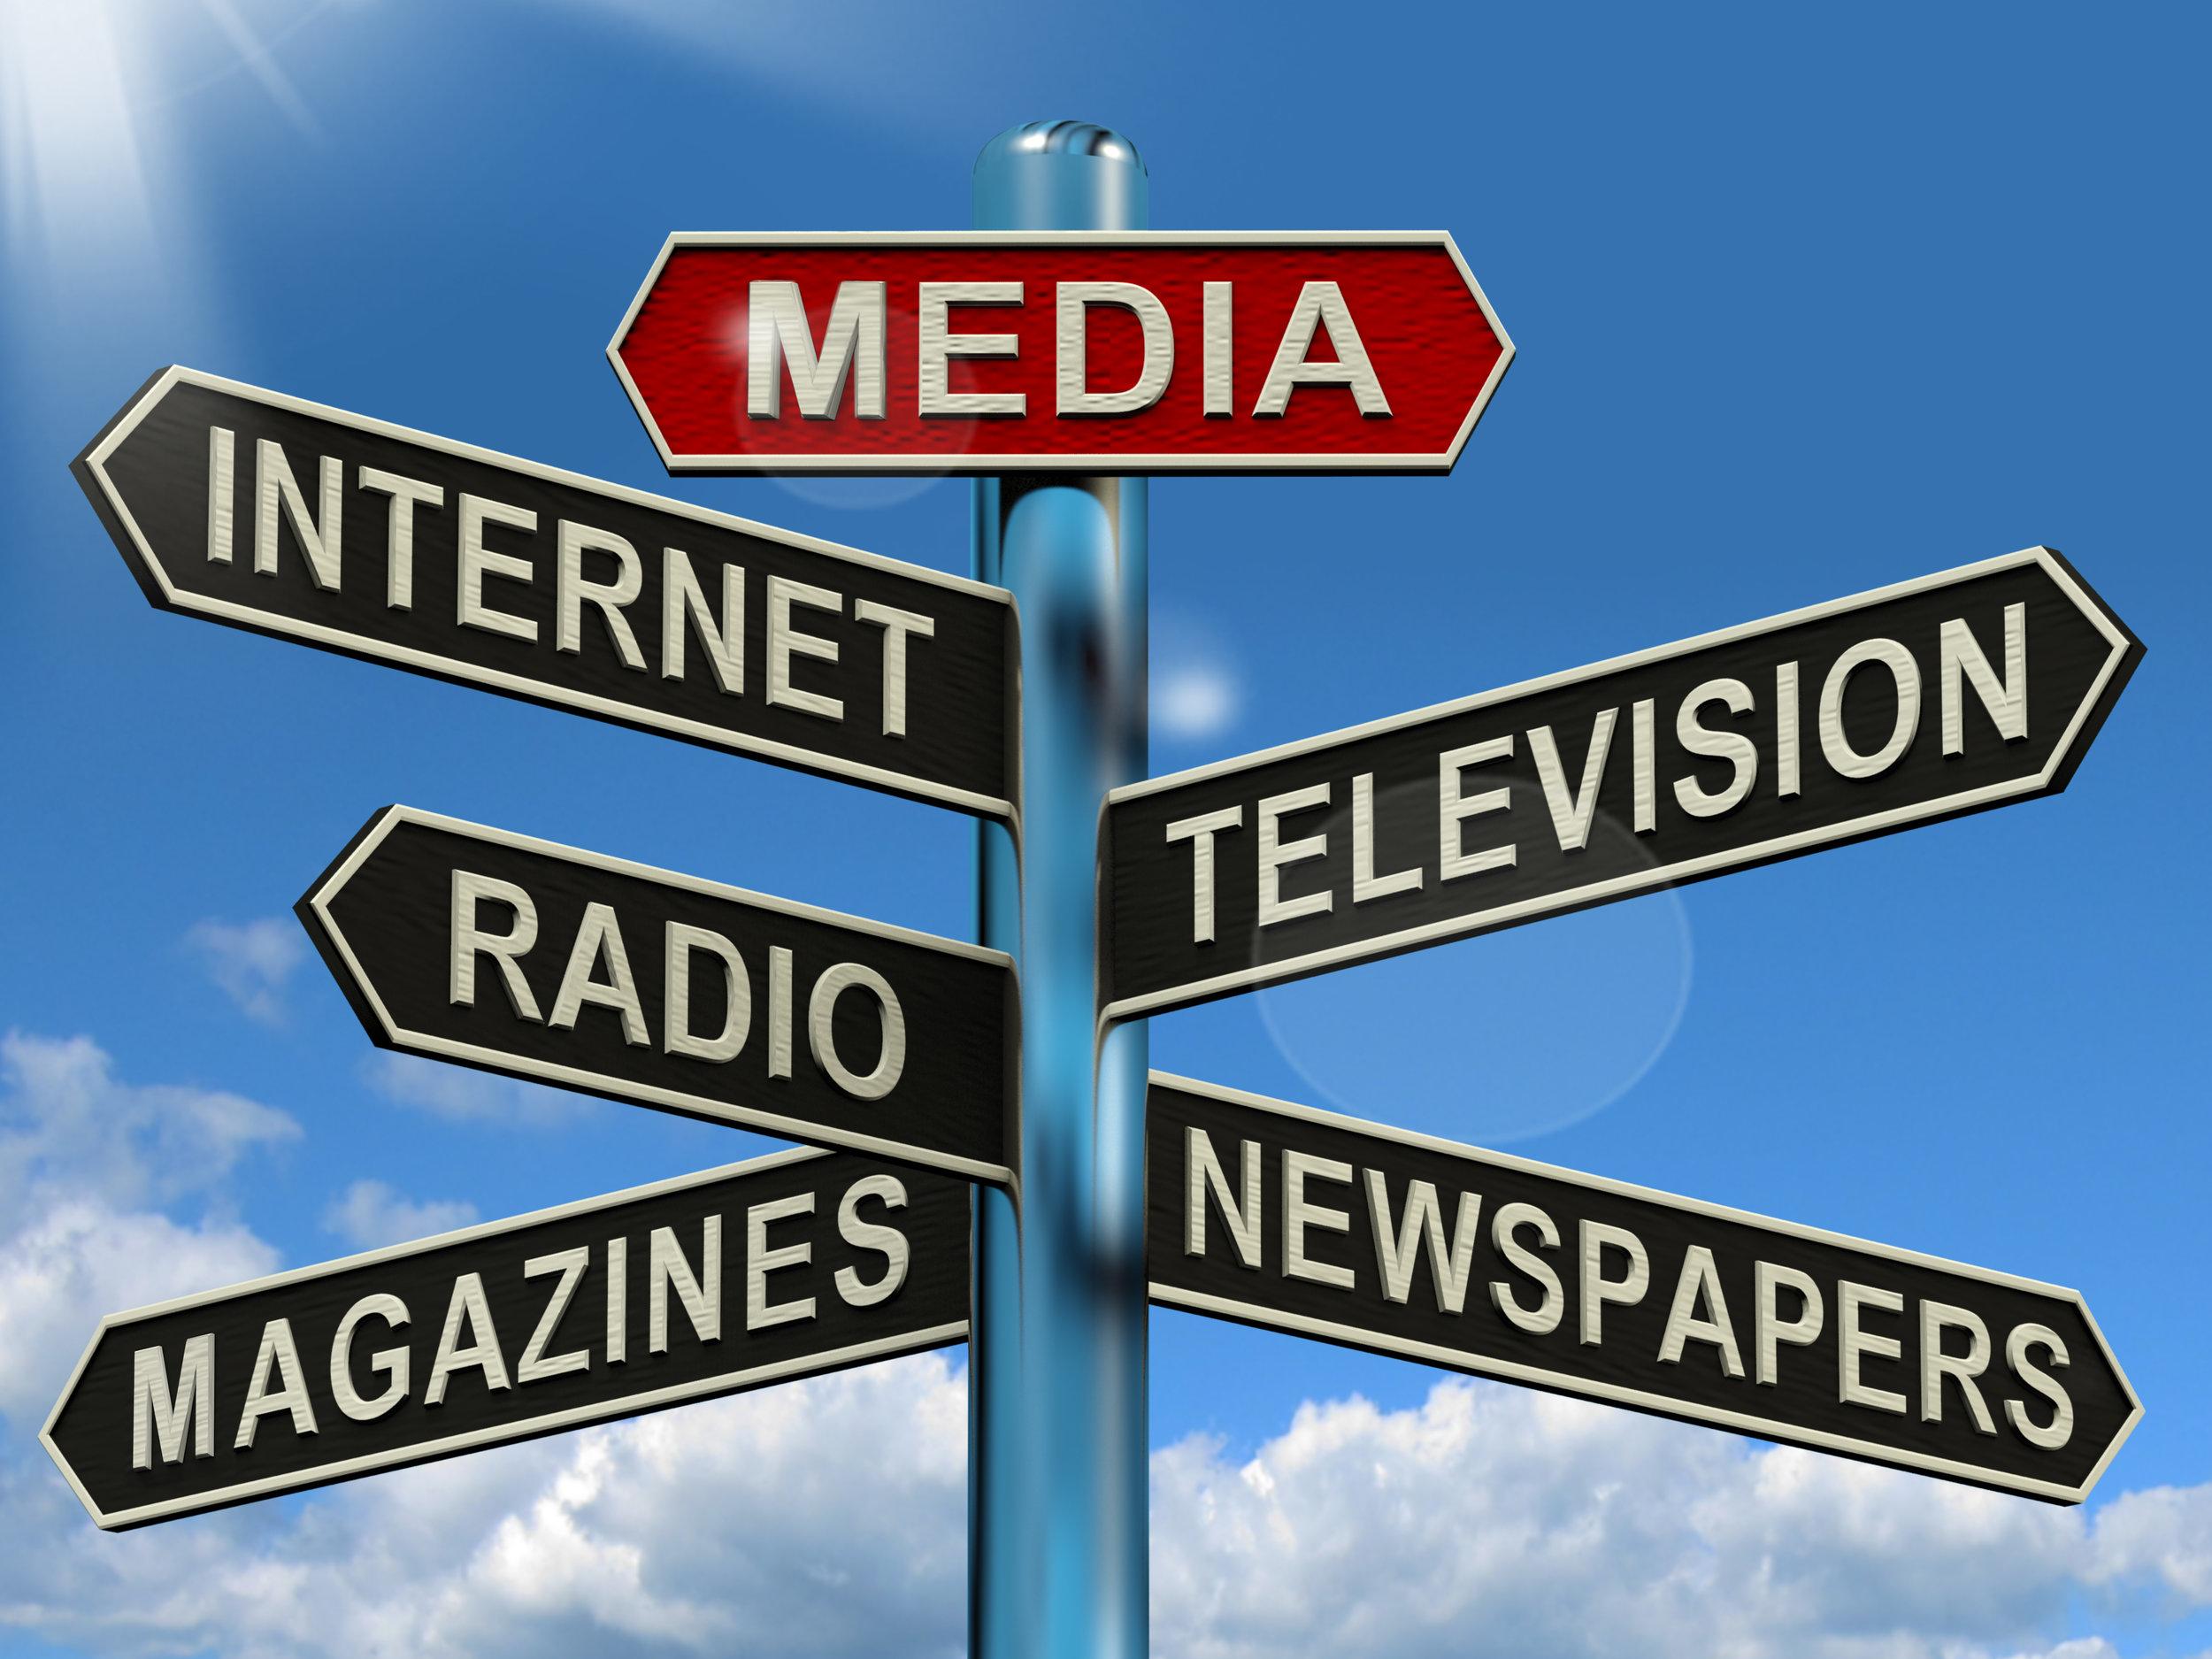 media targets image.jpg